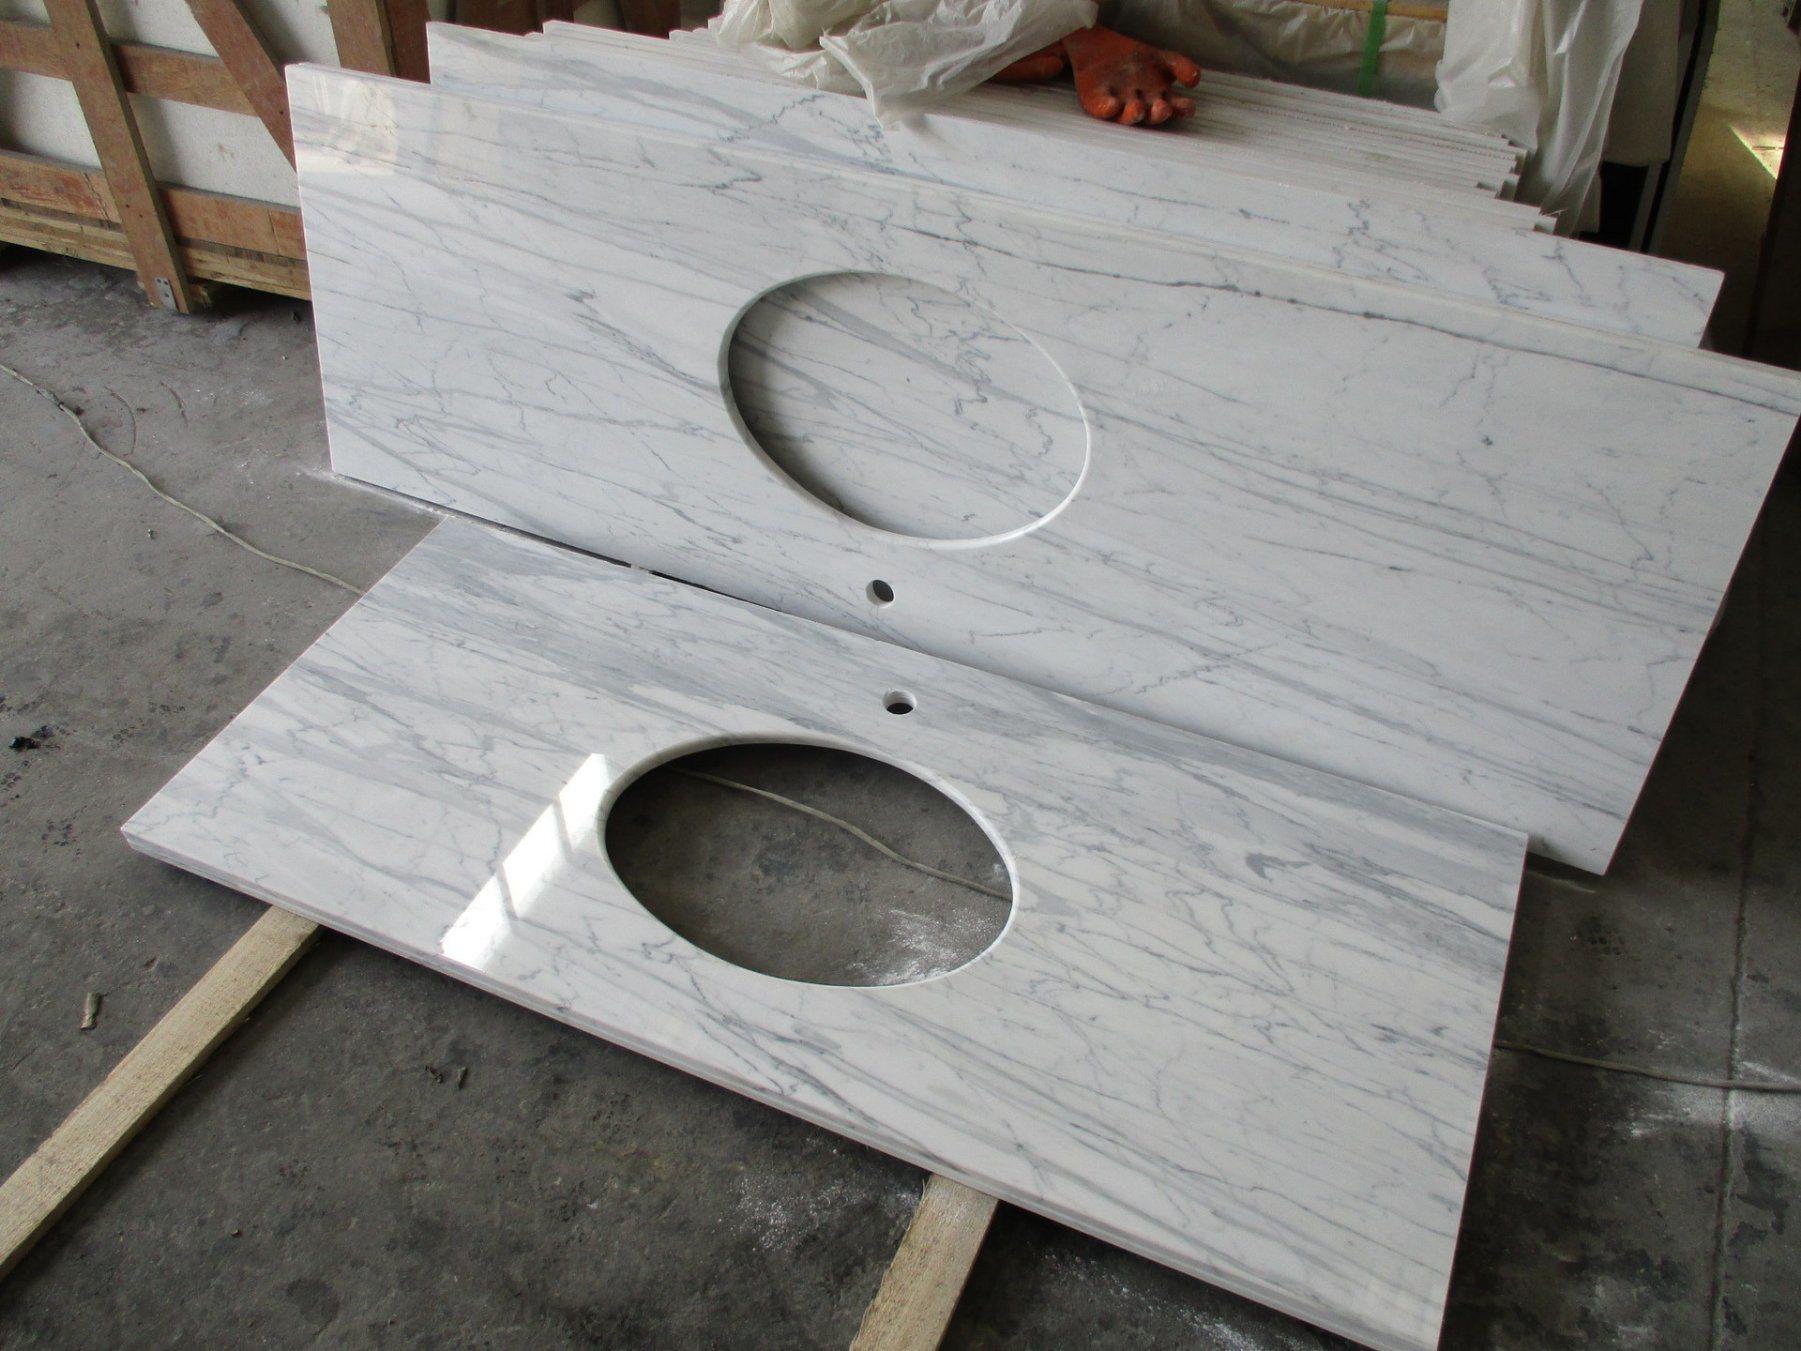 Carrara white grey beige prefab granite marble laminate bathroom natural kitchen island bathroom countertops vanity tops table top